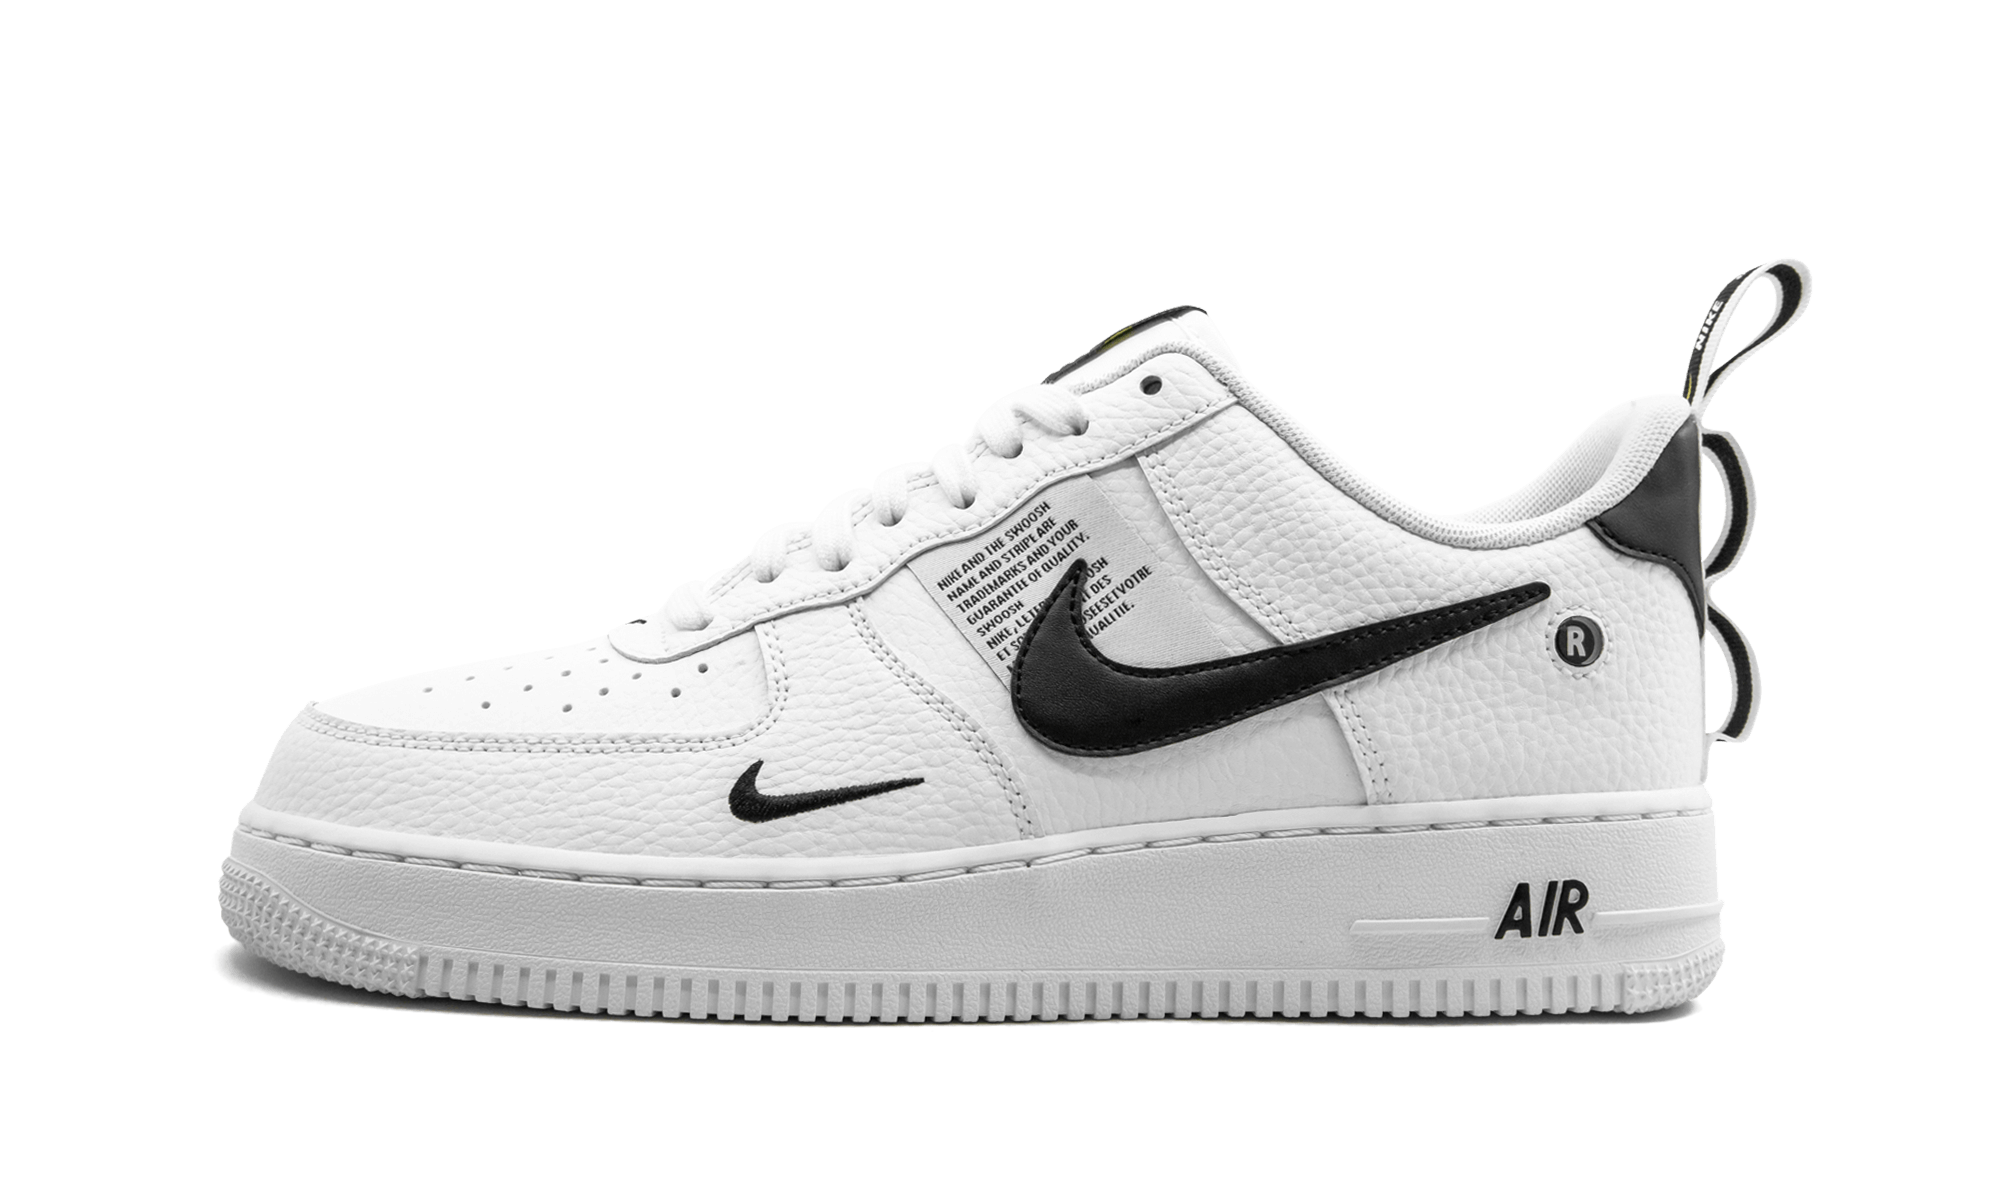 Nike Air Force 1 '07 LV8 UTILITY AJ7747 100 Nike air